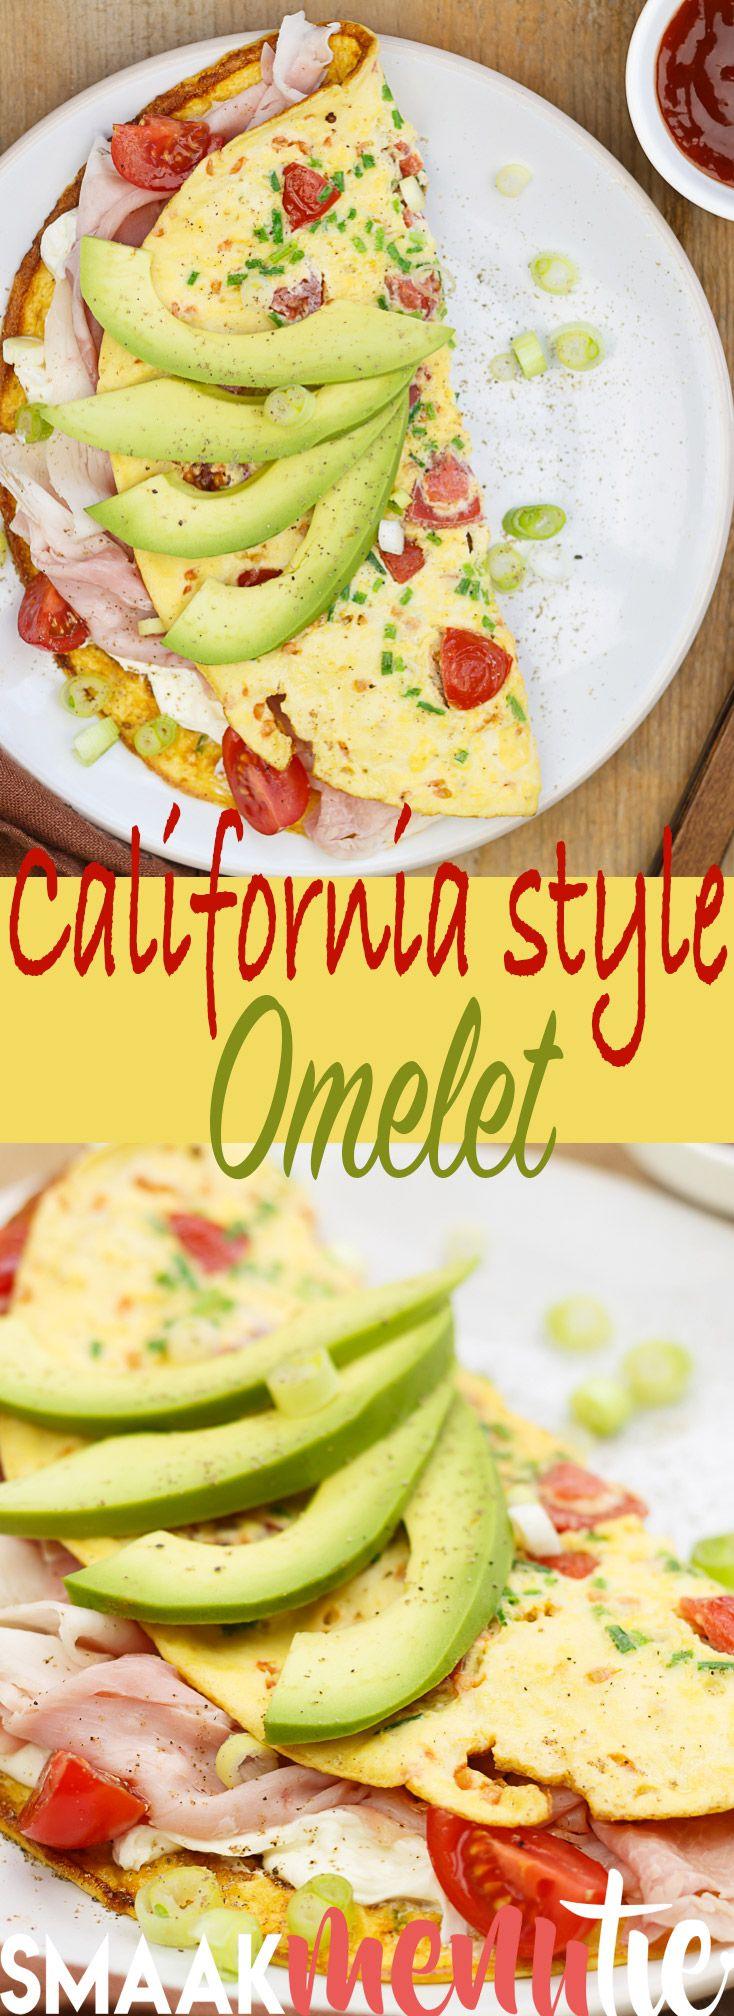 California style omelet #recept #recipes #brunch #lunch #omelet